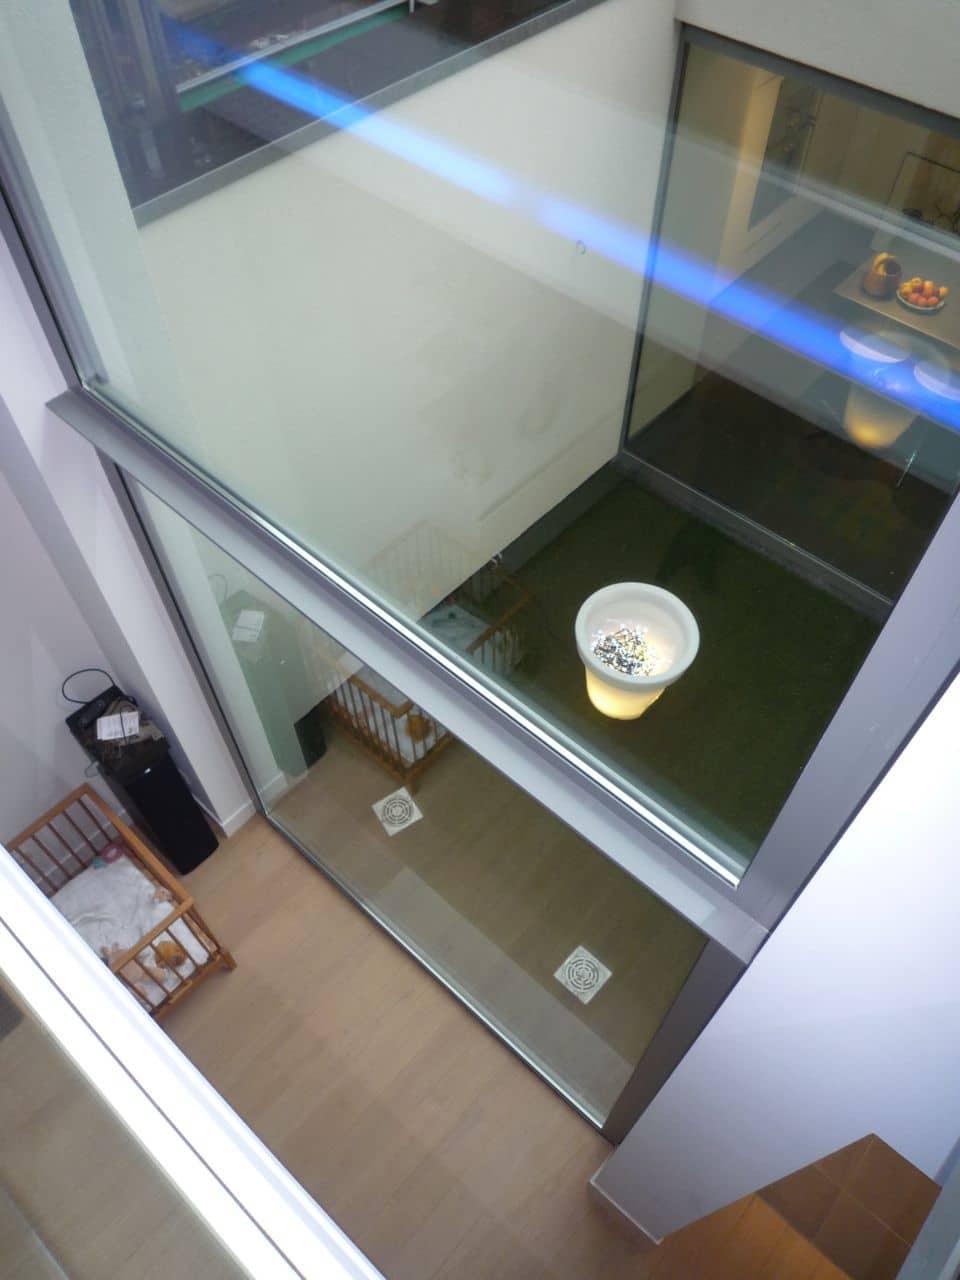 P1050570 | Baeyens & Beck architecten Gent | architect nieuwbouw renovatie interieur | high end | architectenbureau